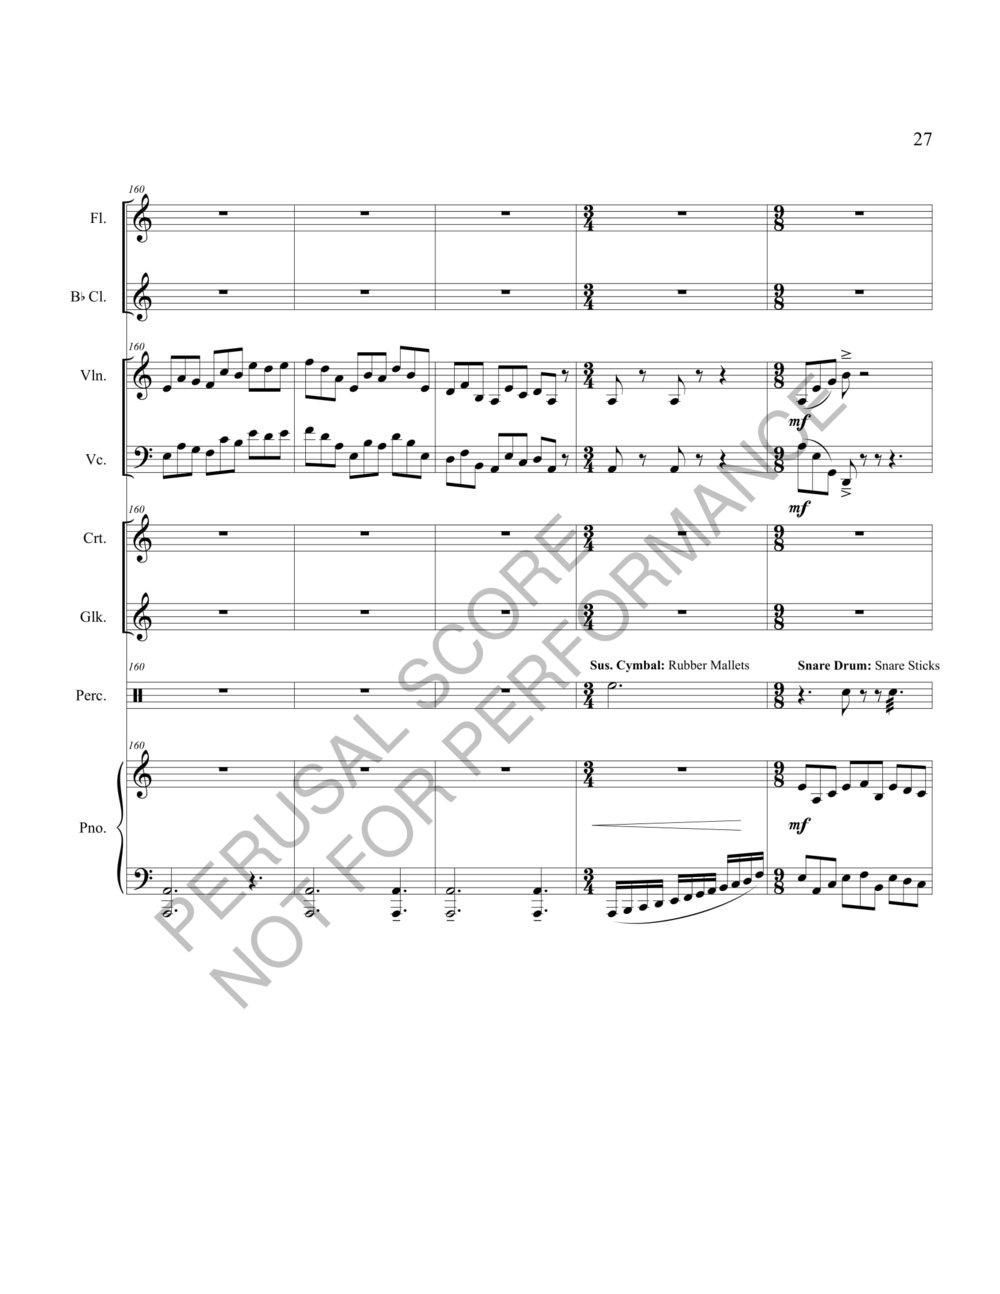 Boyd Terra Liberi Score-watermark-33.jpg